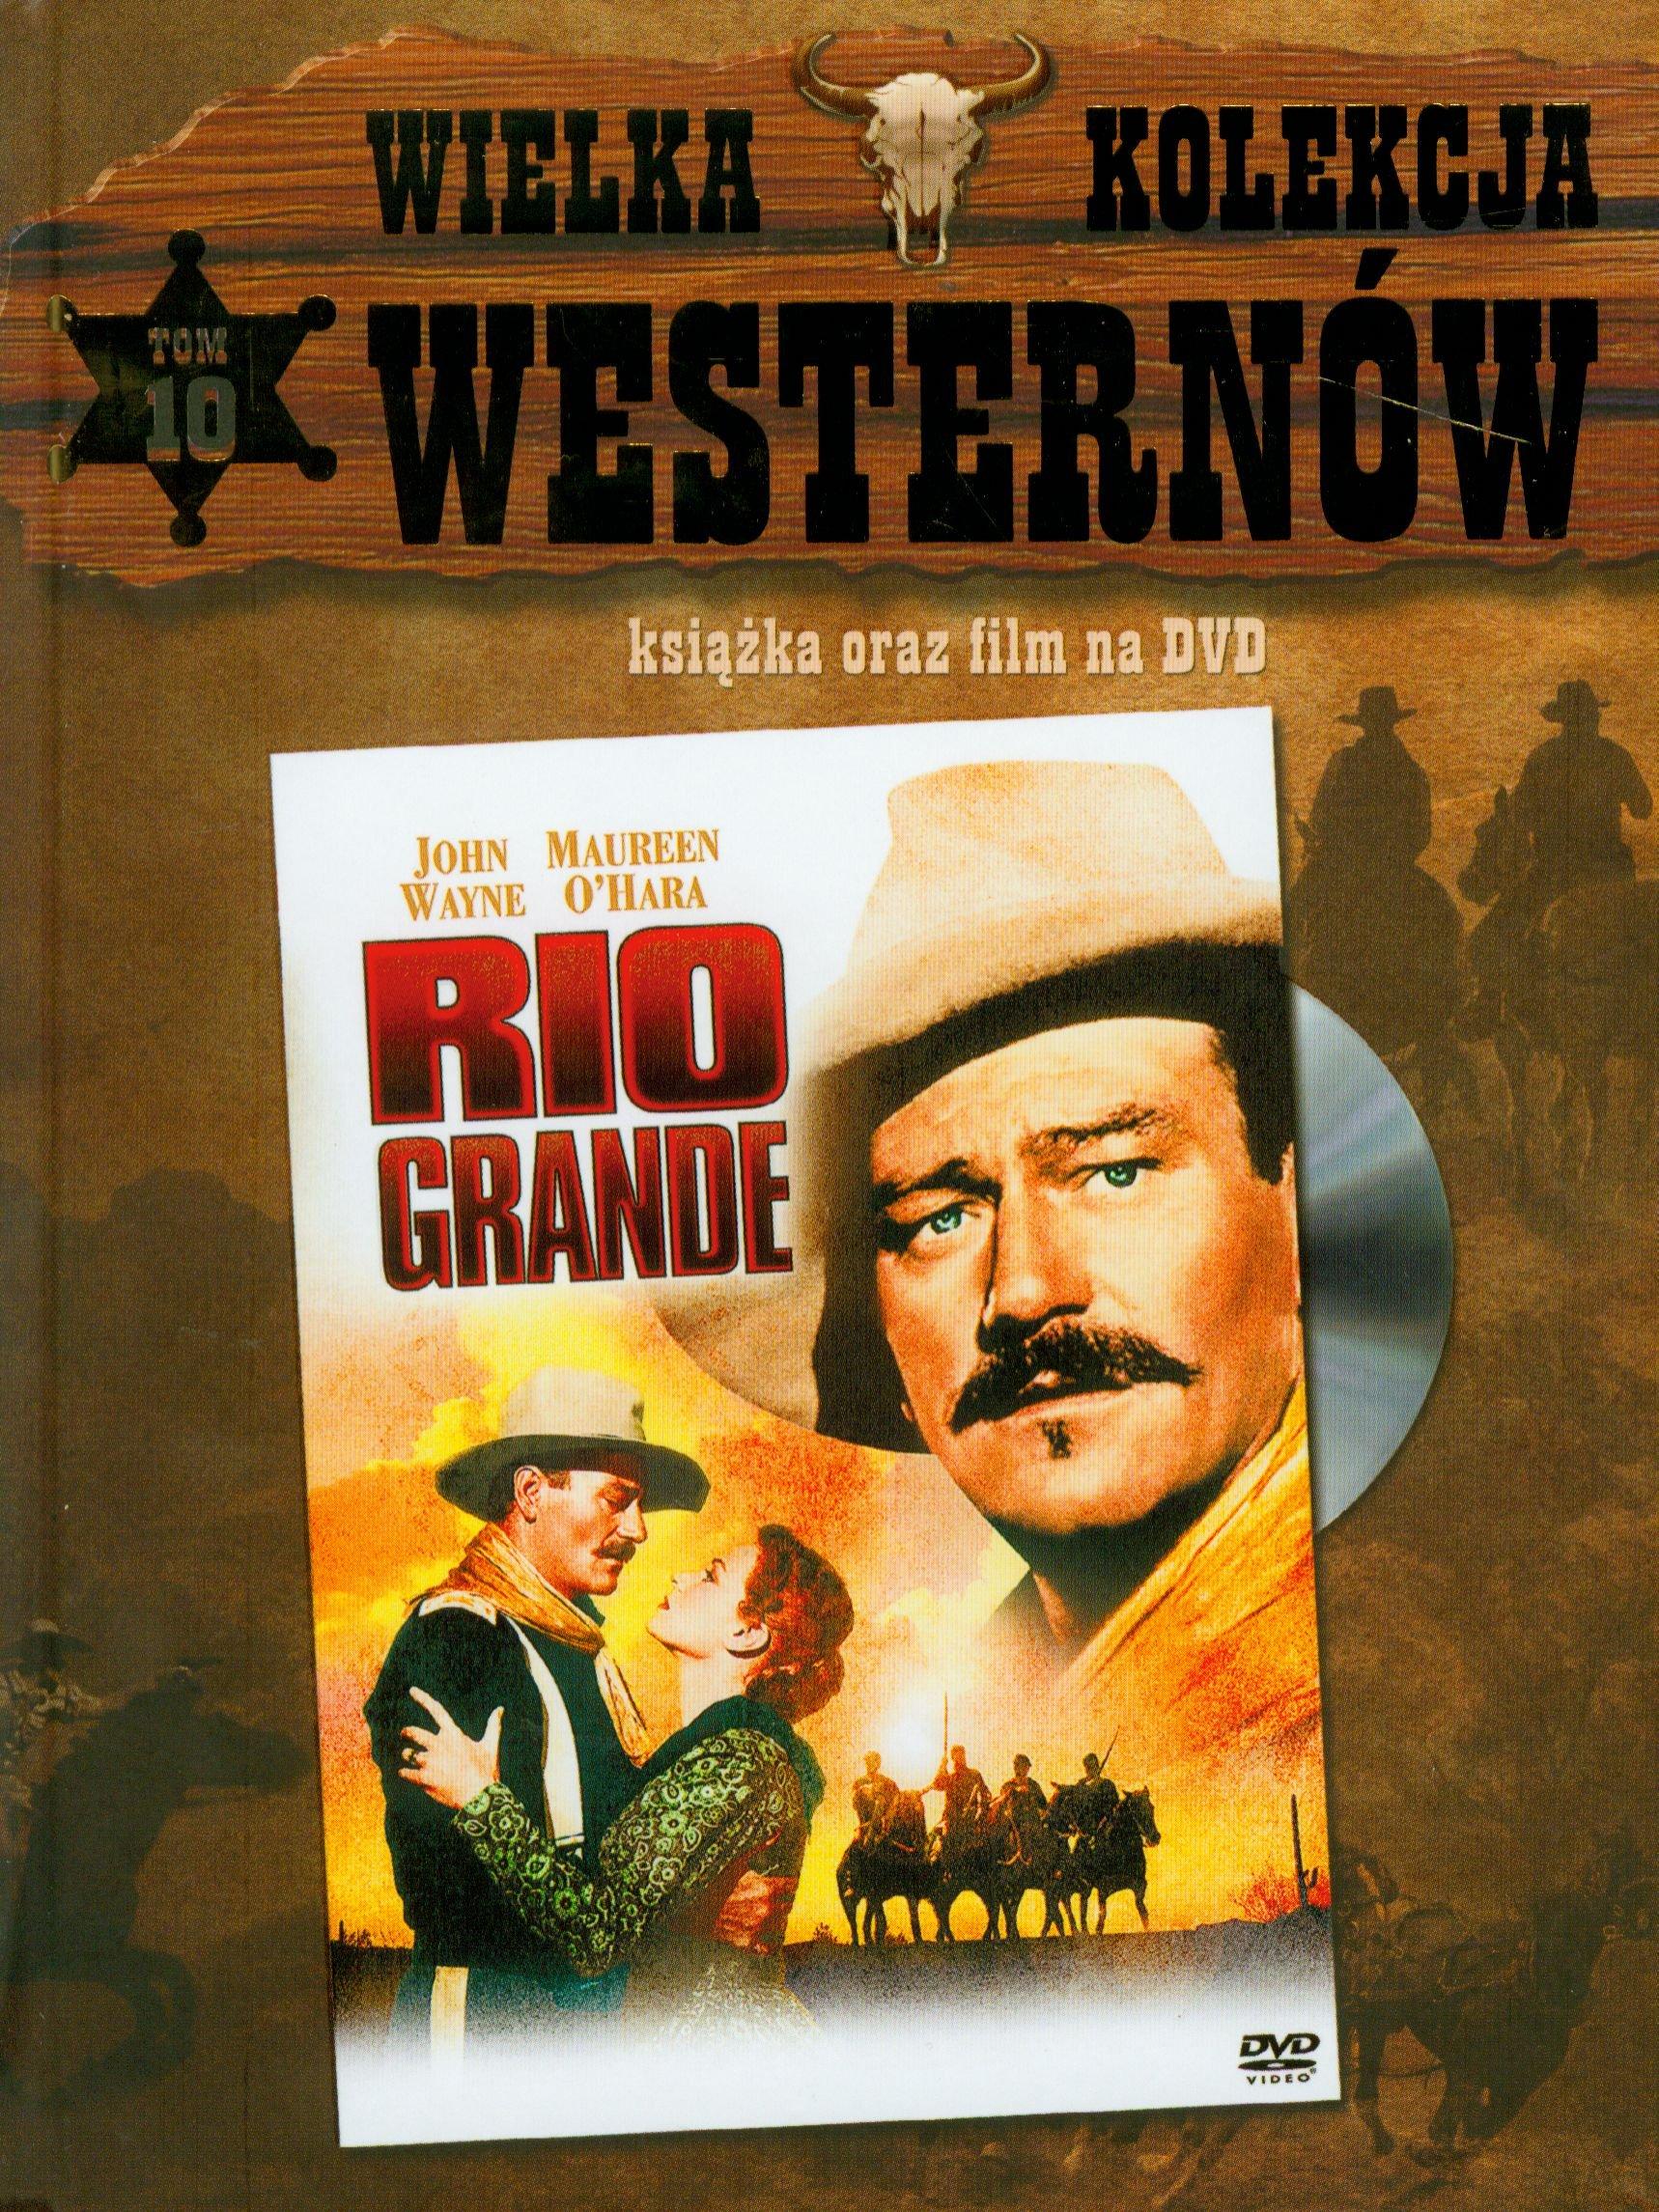 Wielka Kolekcja Westernow 10 Rio Grande